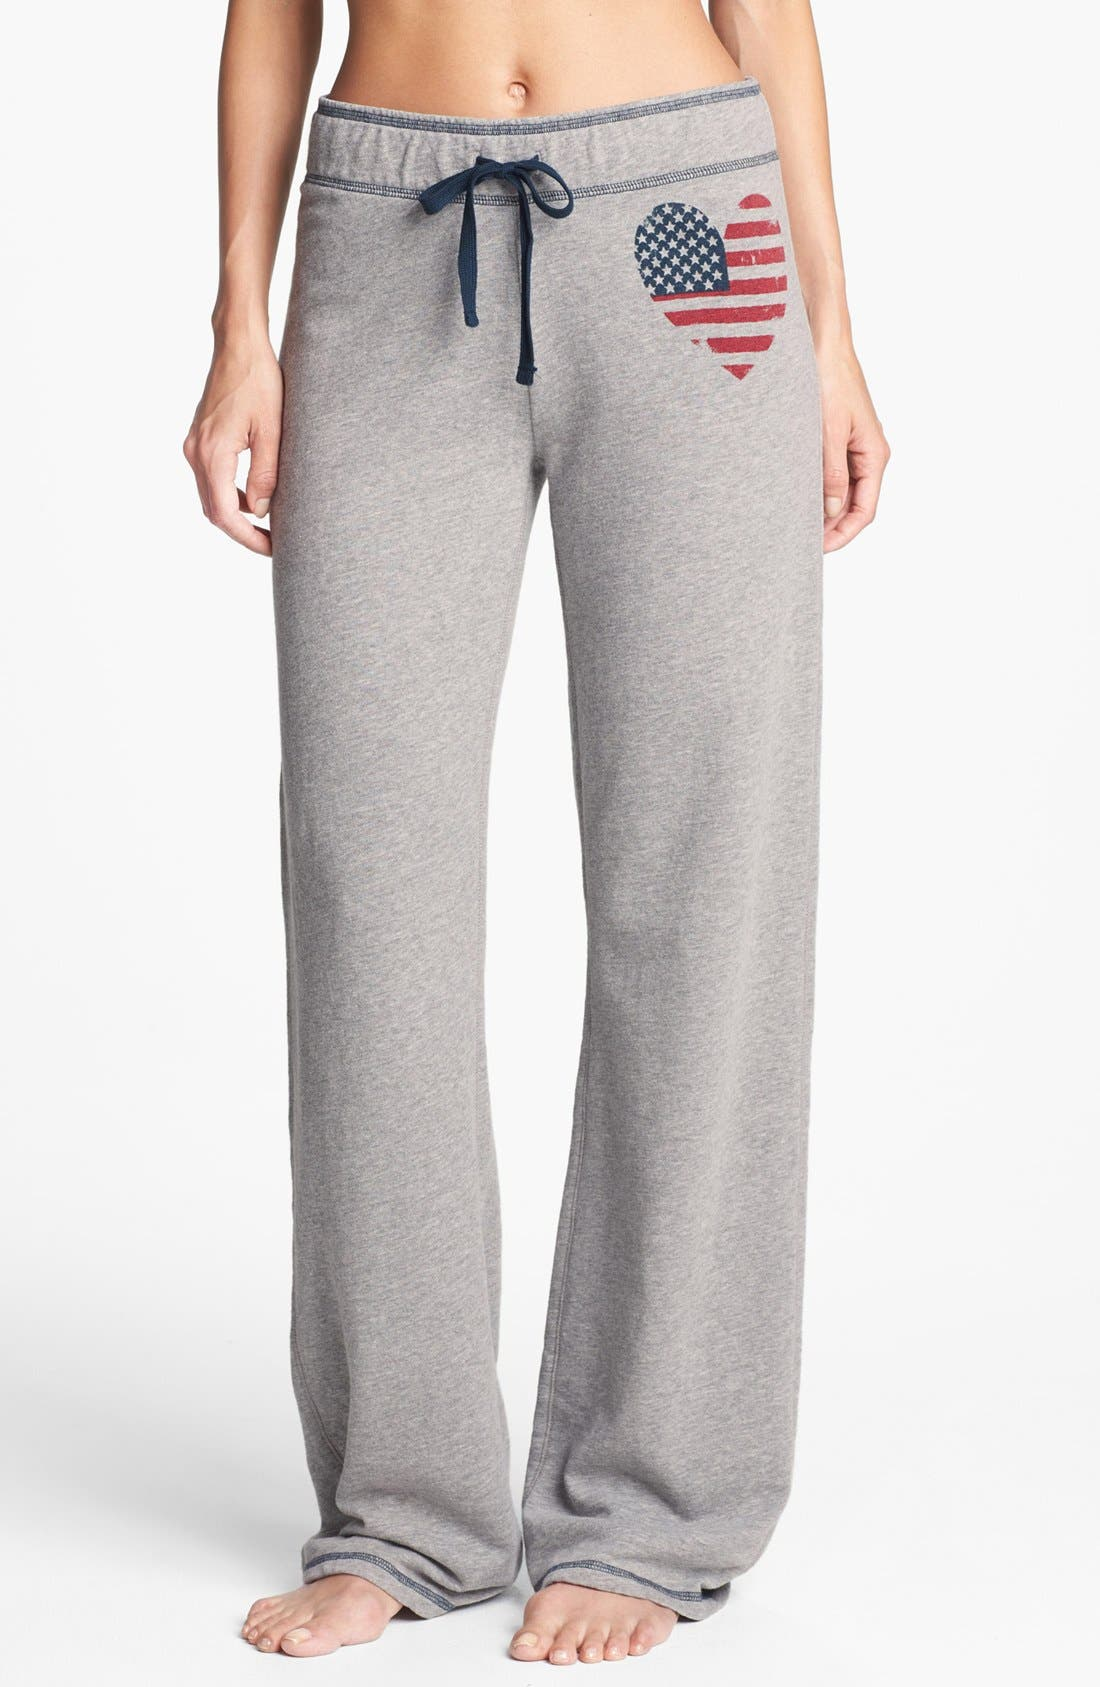 Main Image - PJ Salvage 'Stars & Stripes' Pants